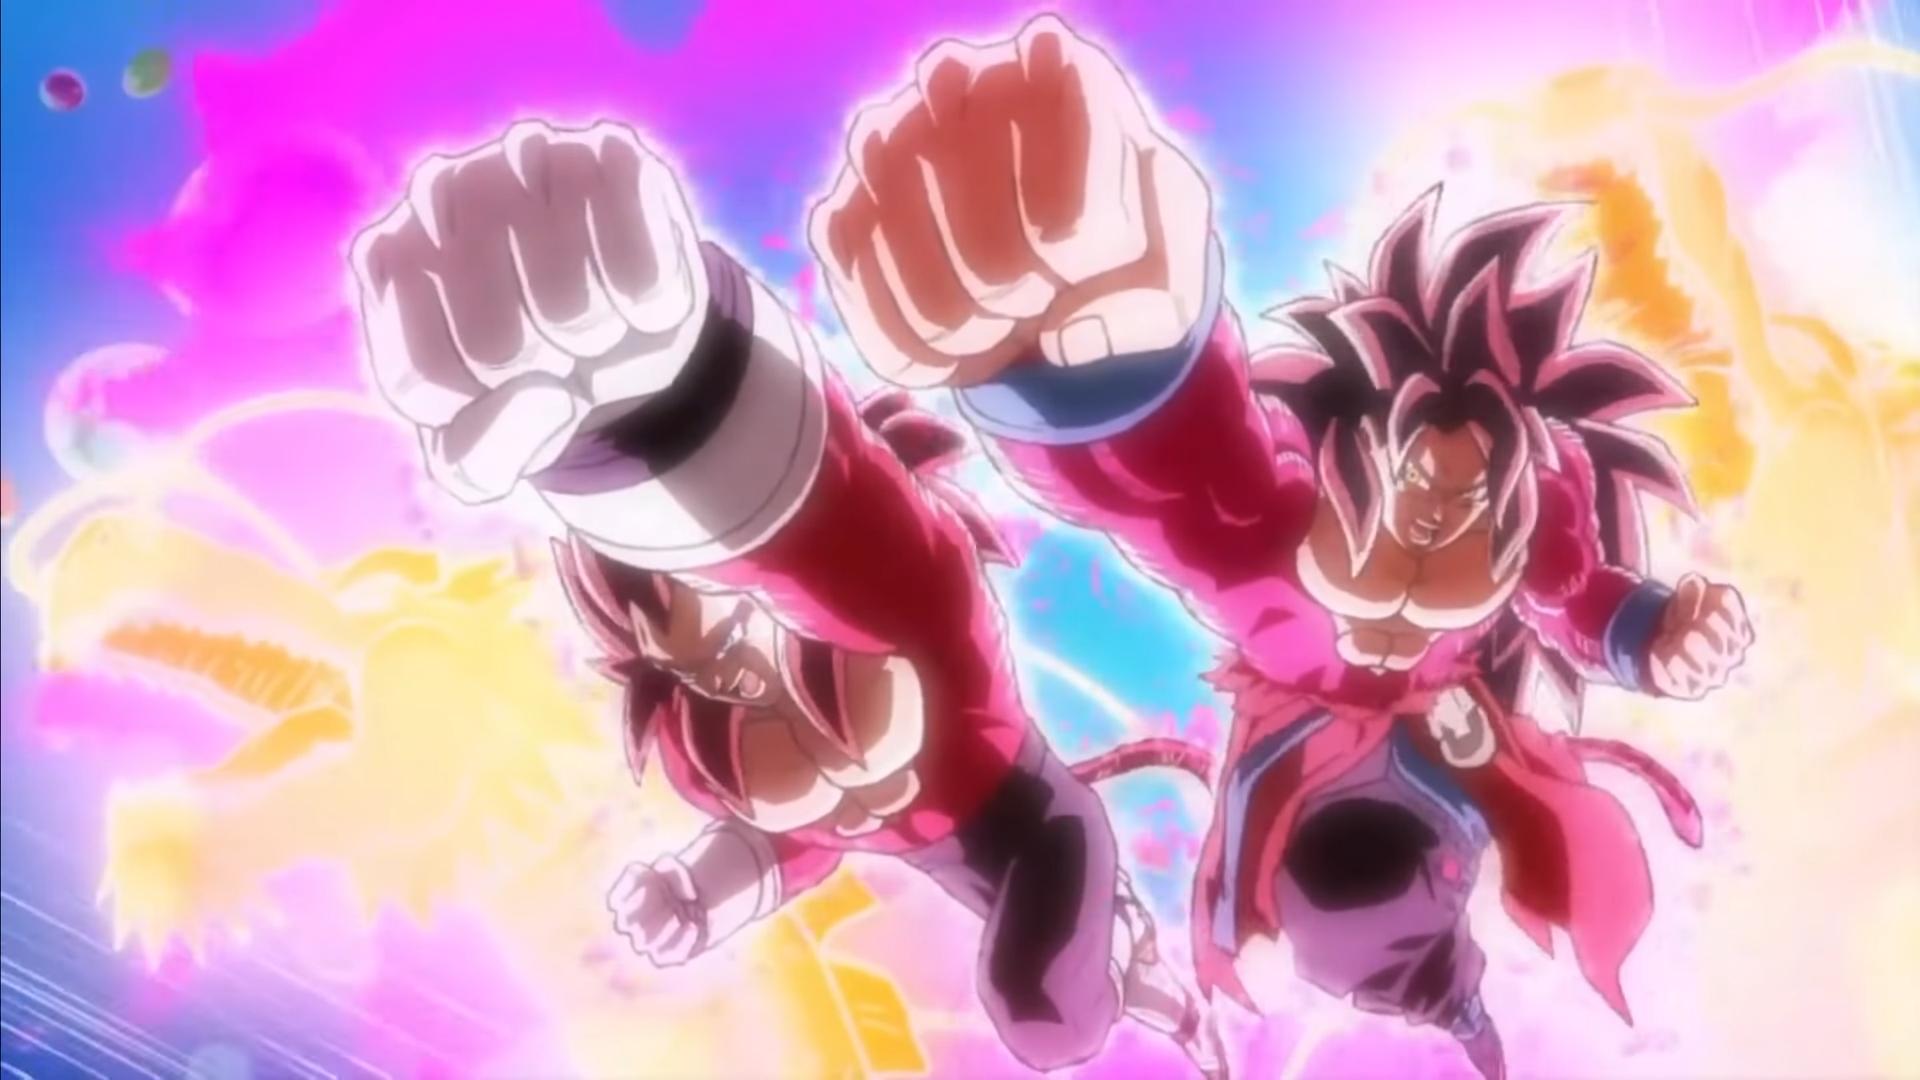 Limit Breaker Double Ultimate Dragon Fist Dragon Ball Wiki Fandom